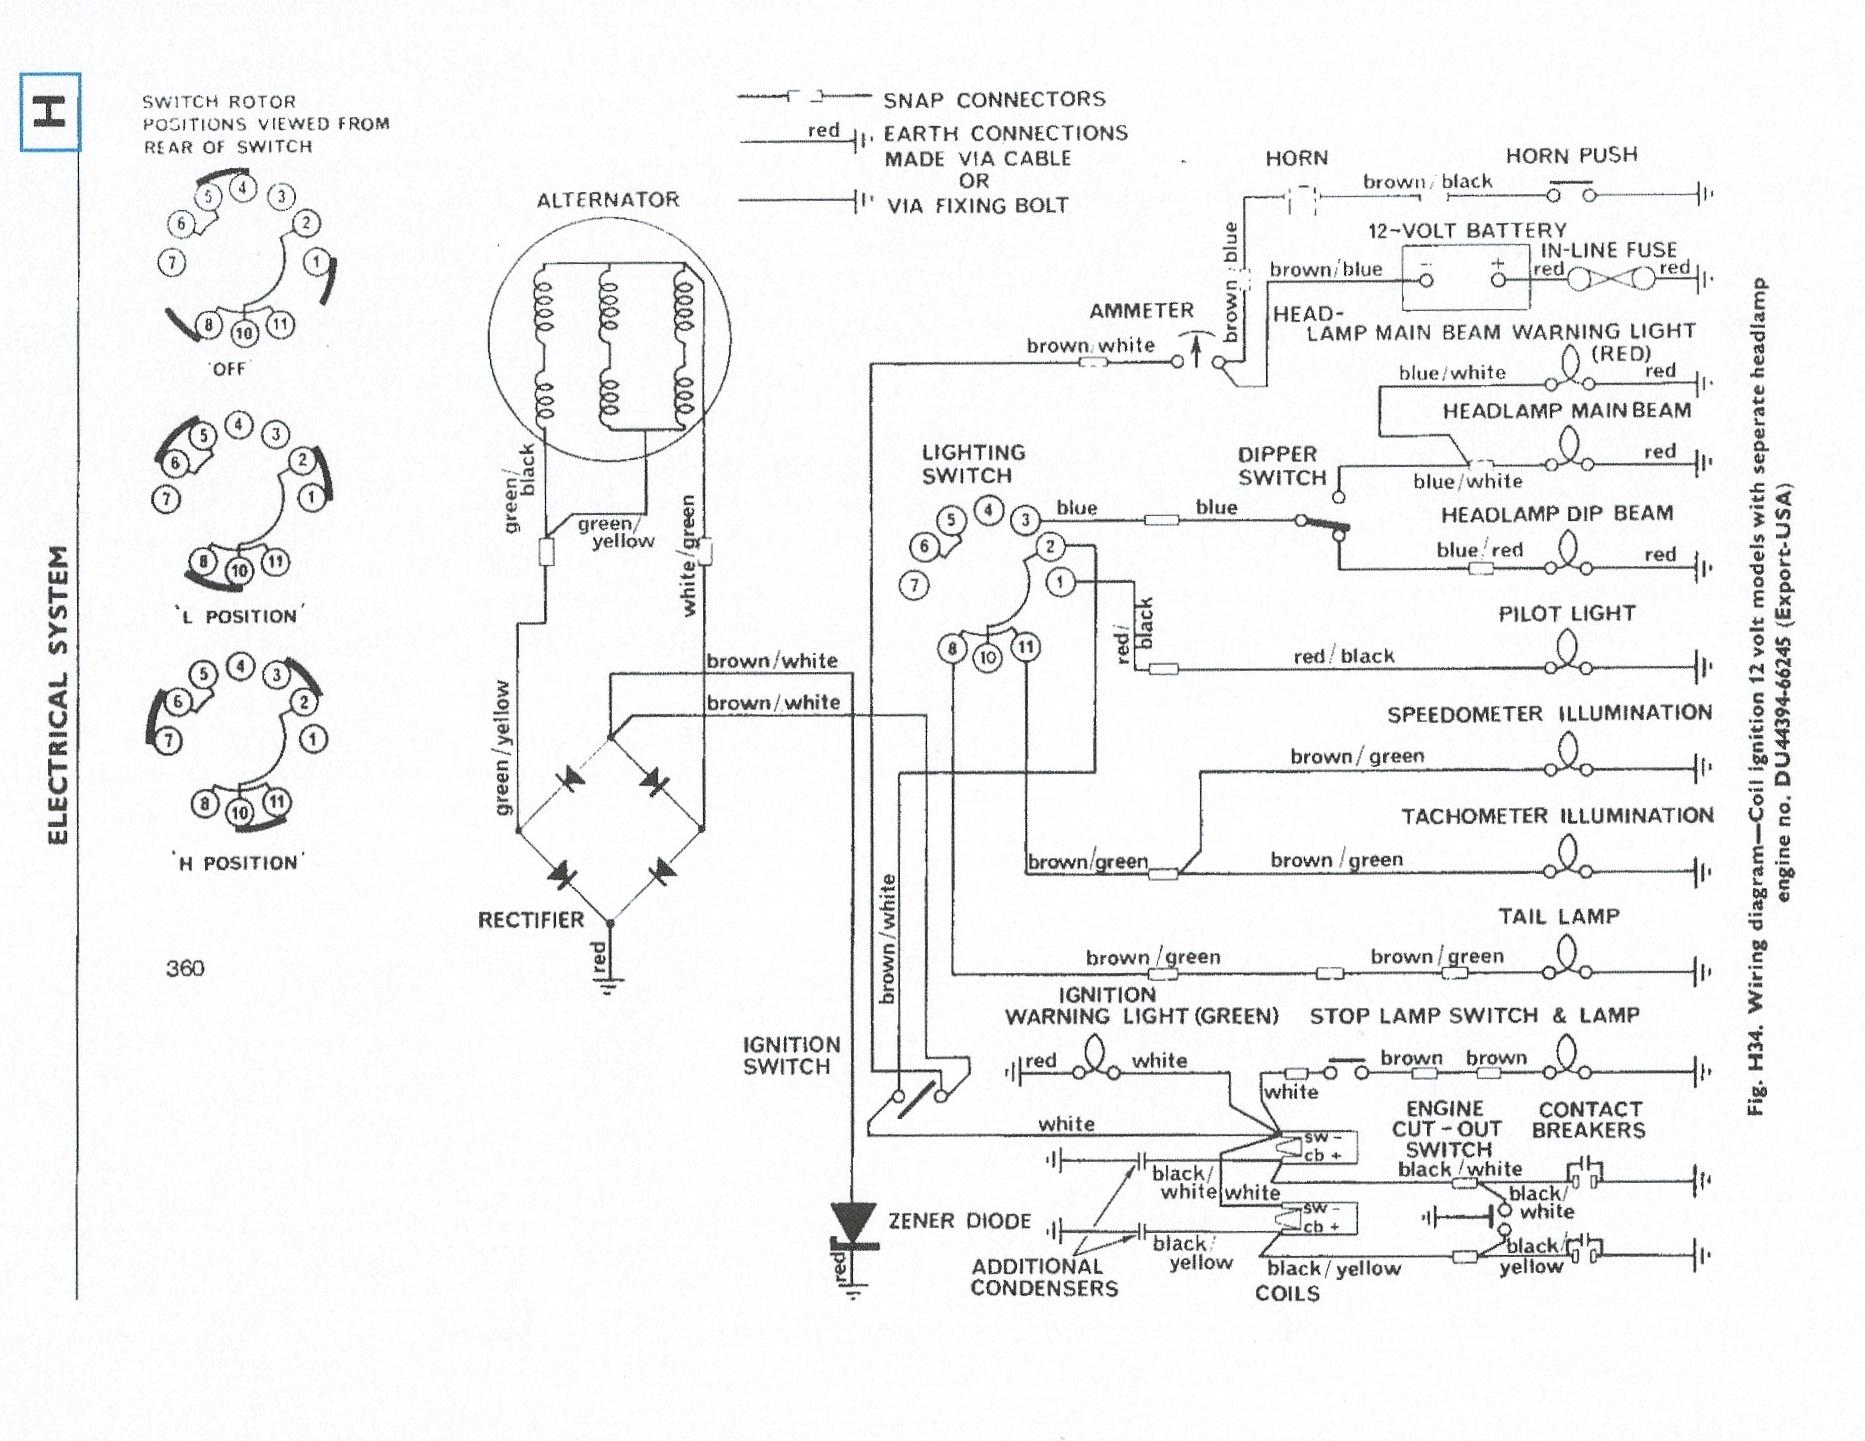 1995 Yamaha Timberwolf Motor Diagram 250 Engine